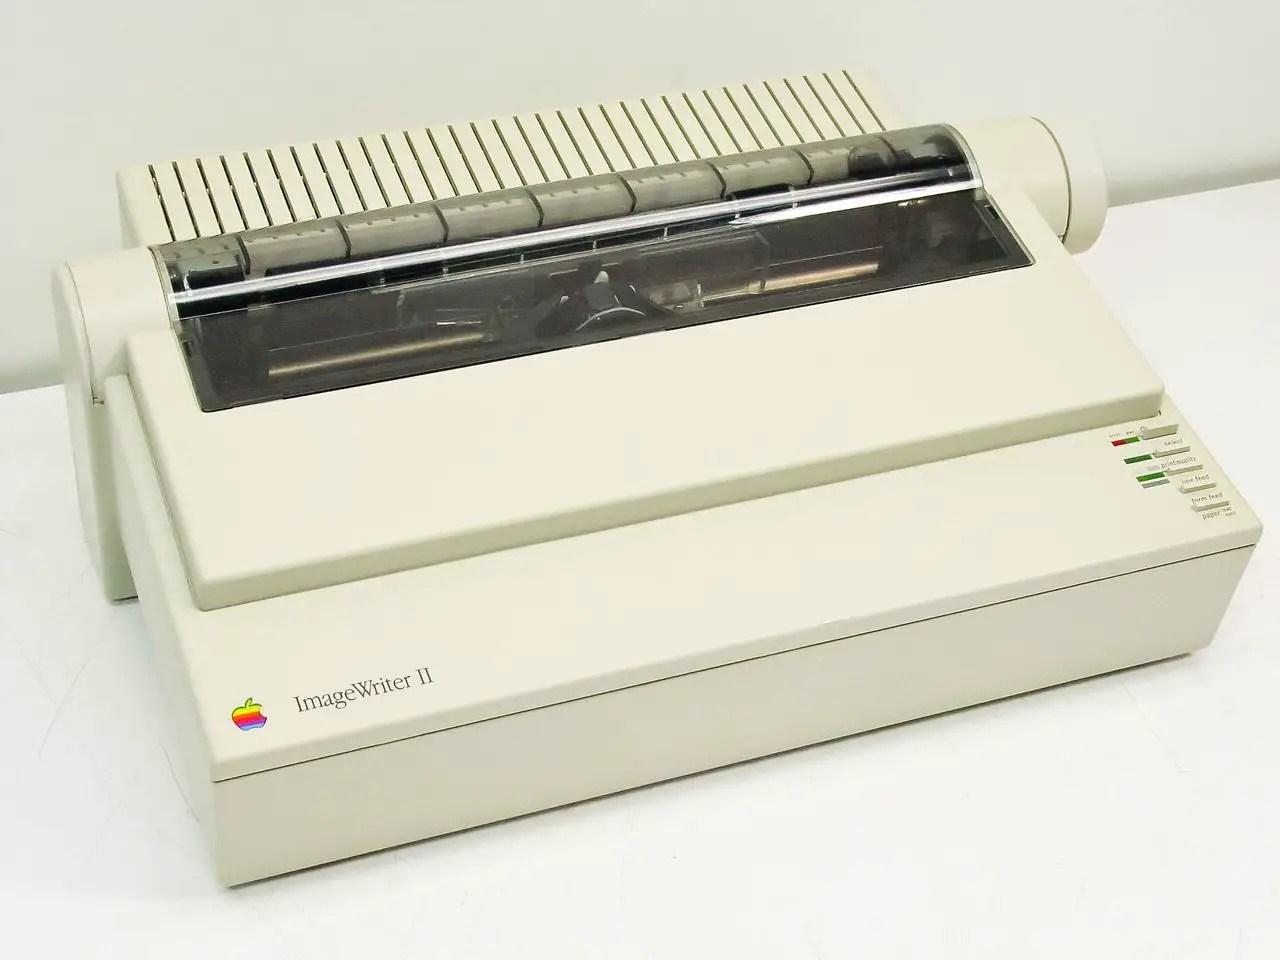 Apple ImageWriter II